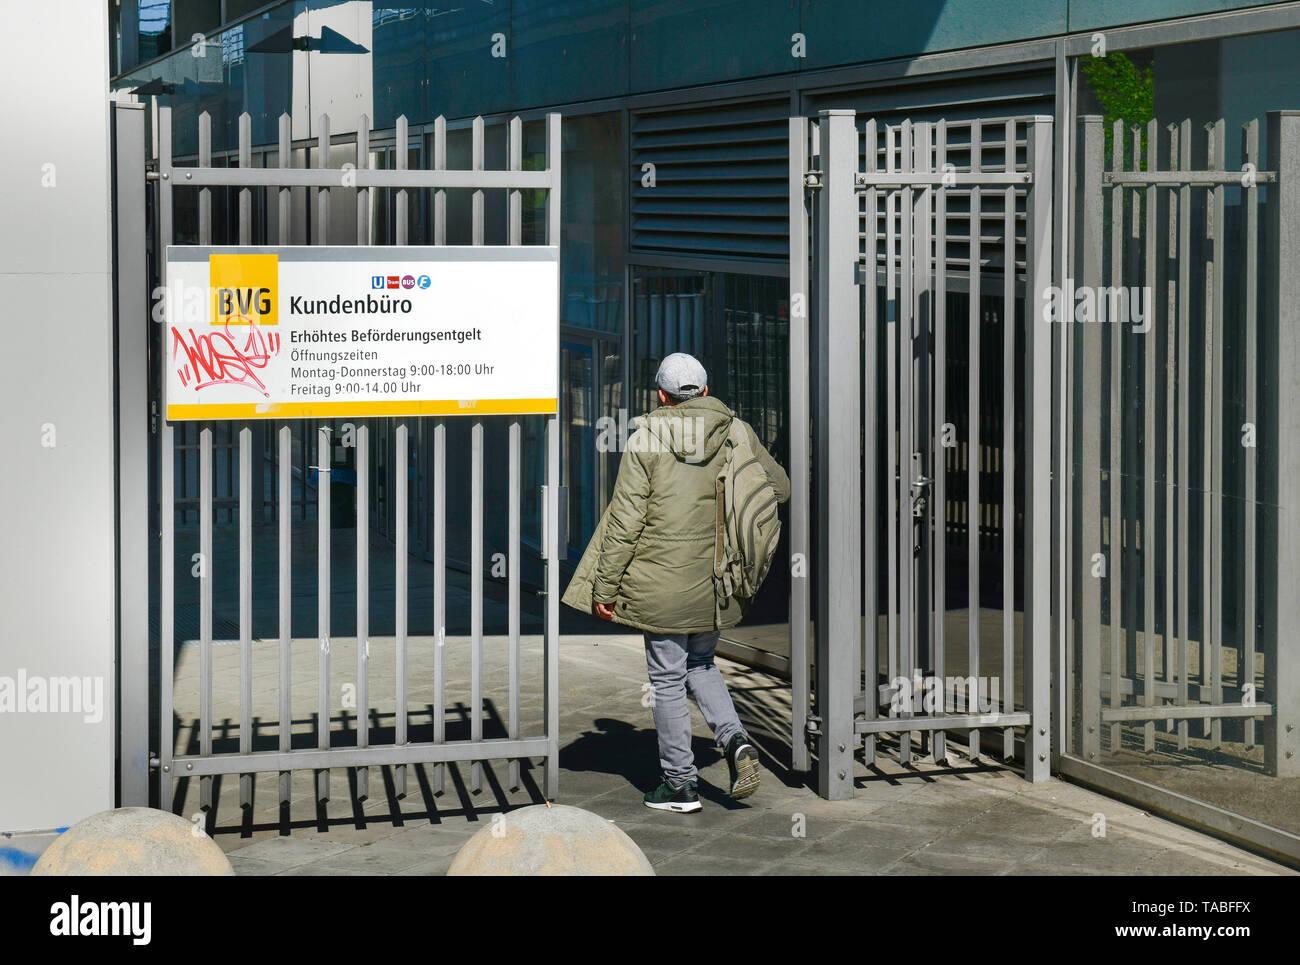 Customer office raised Beförderungsentgeld, black driver, BVG headquarters, Holzmarktstrasse, middle, Berlin, Germany, Kundenbüro Erhöhtes Beförderung Stock Photo